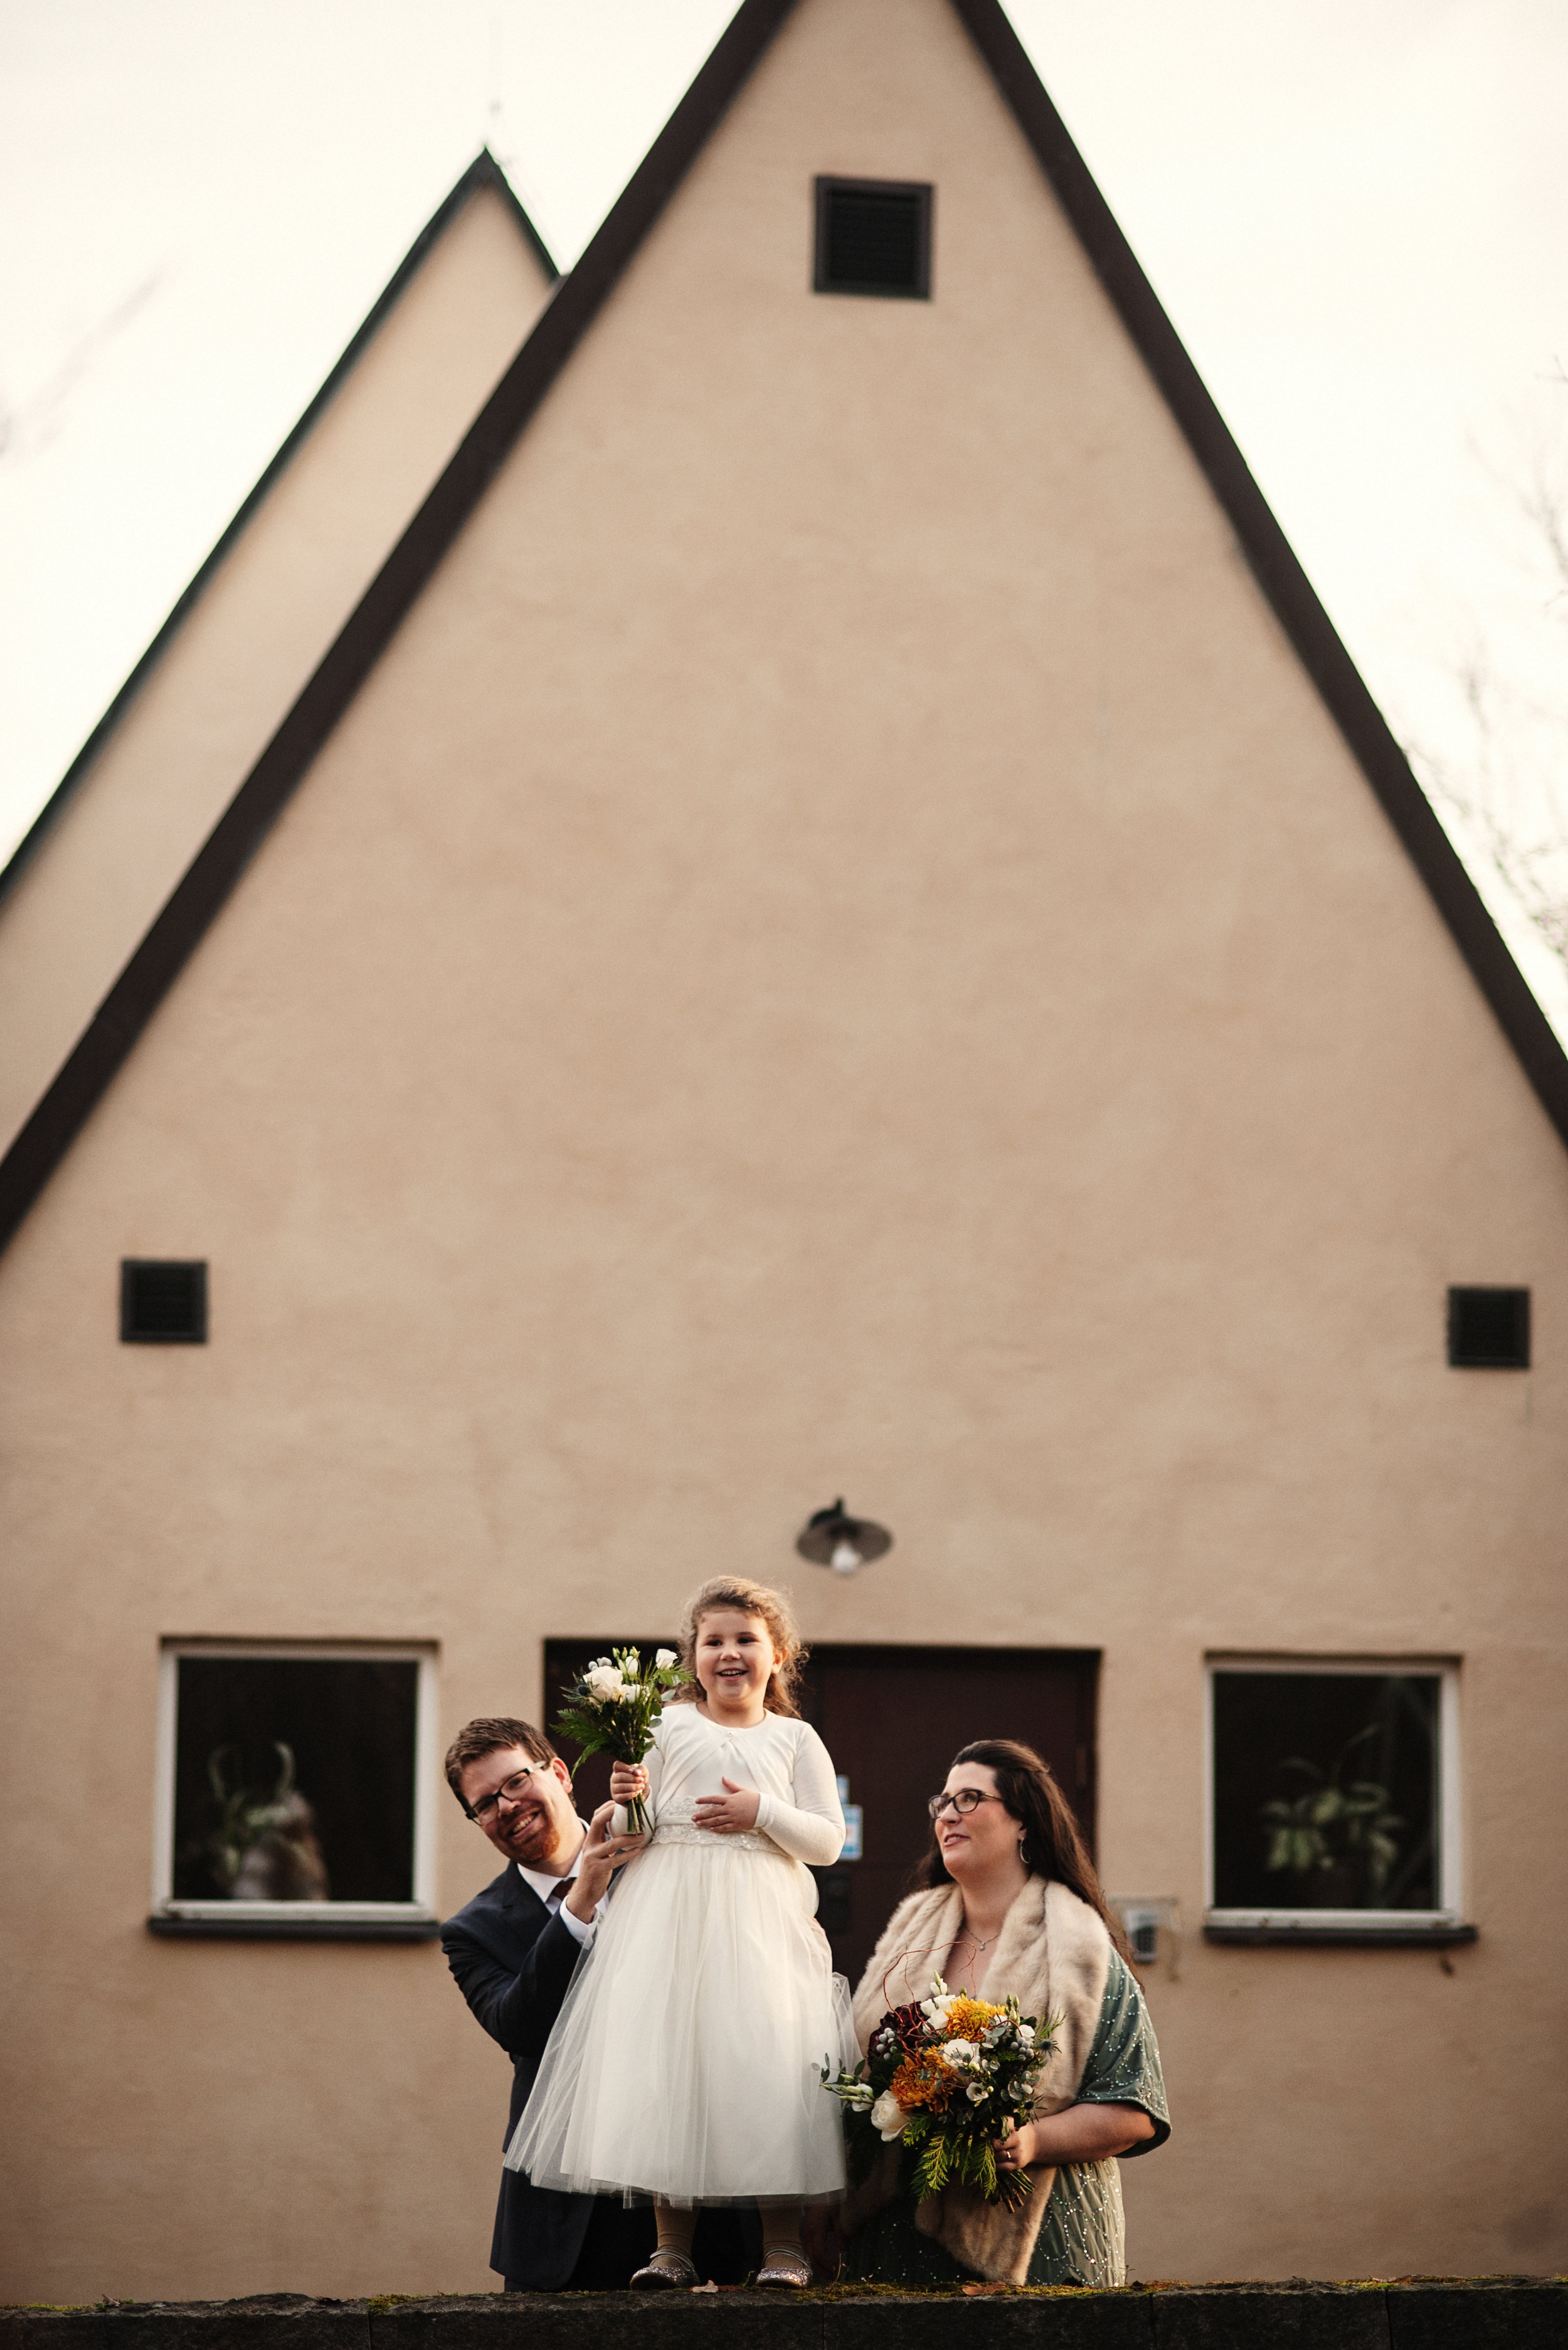 brandochbrindle_andreamagnus_bröllop2018_37.jpg